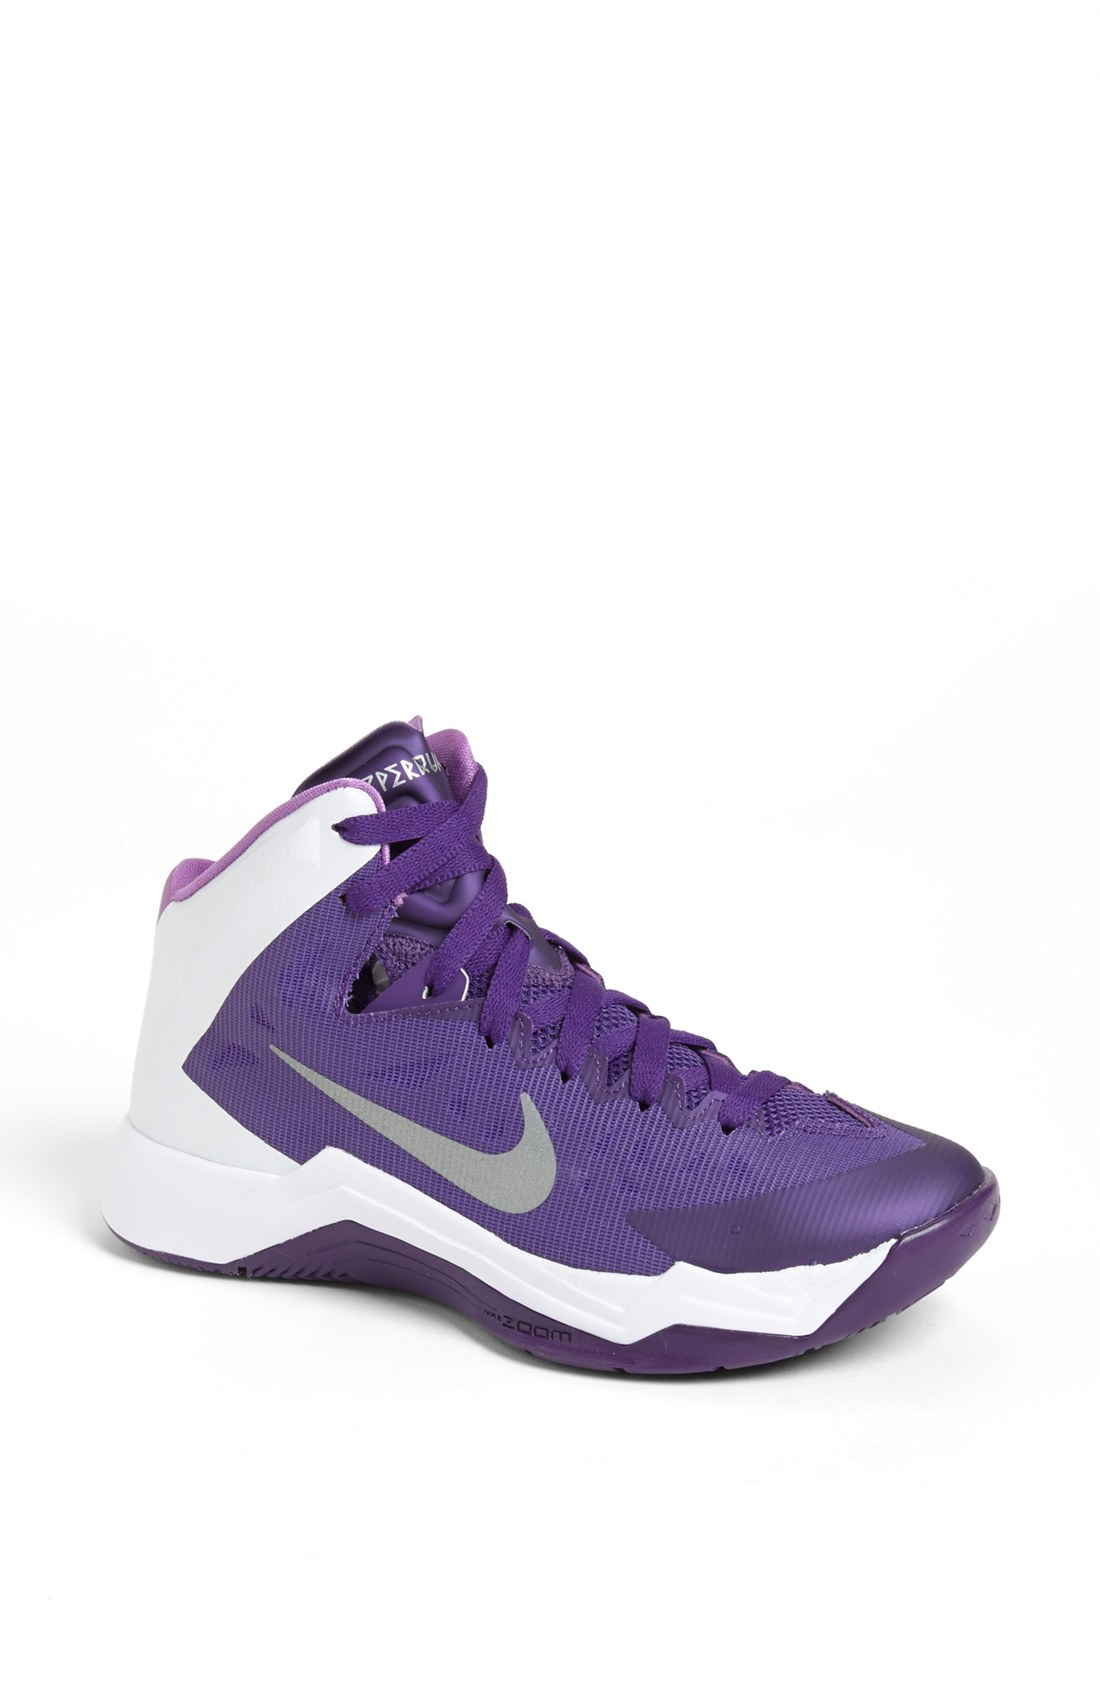 nike hyper quickness tb basketball shoe in purple court